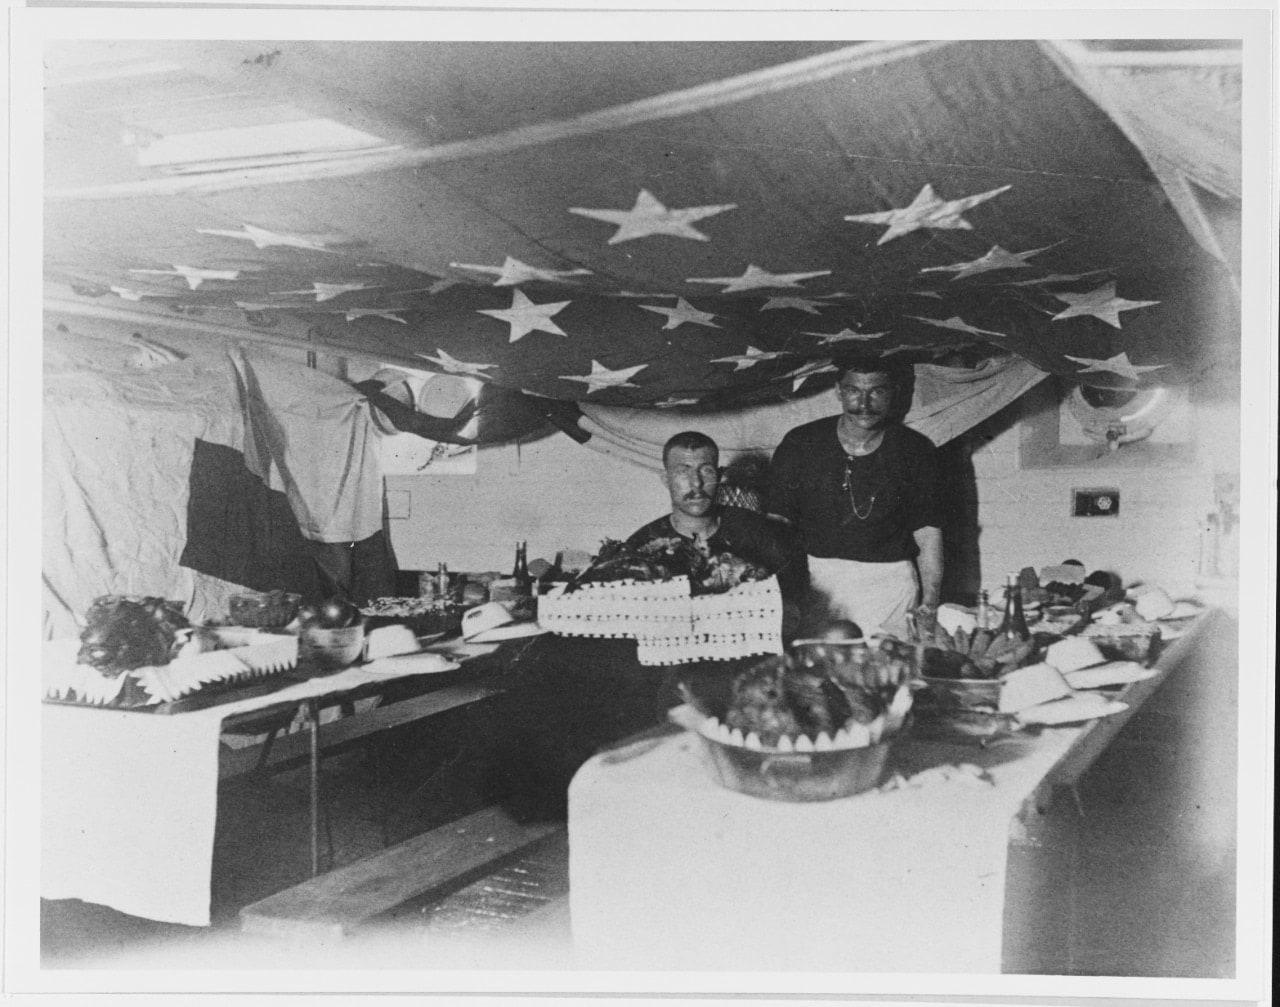 USS Charleston Thanksgiving Day celebrations on board in November 1893, at Rio de Janeiro, Brazil. (Photo: U.S. Navy)